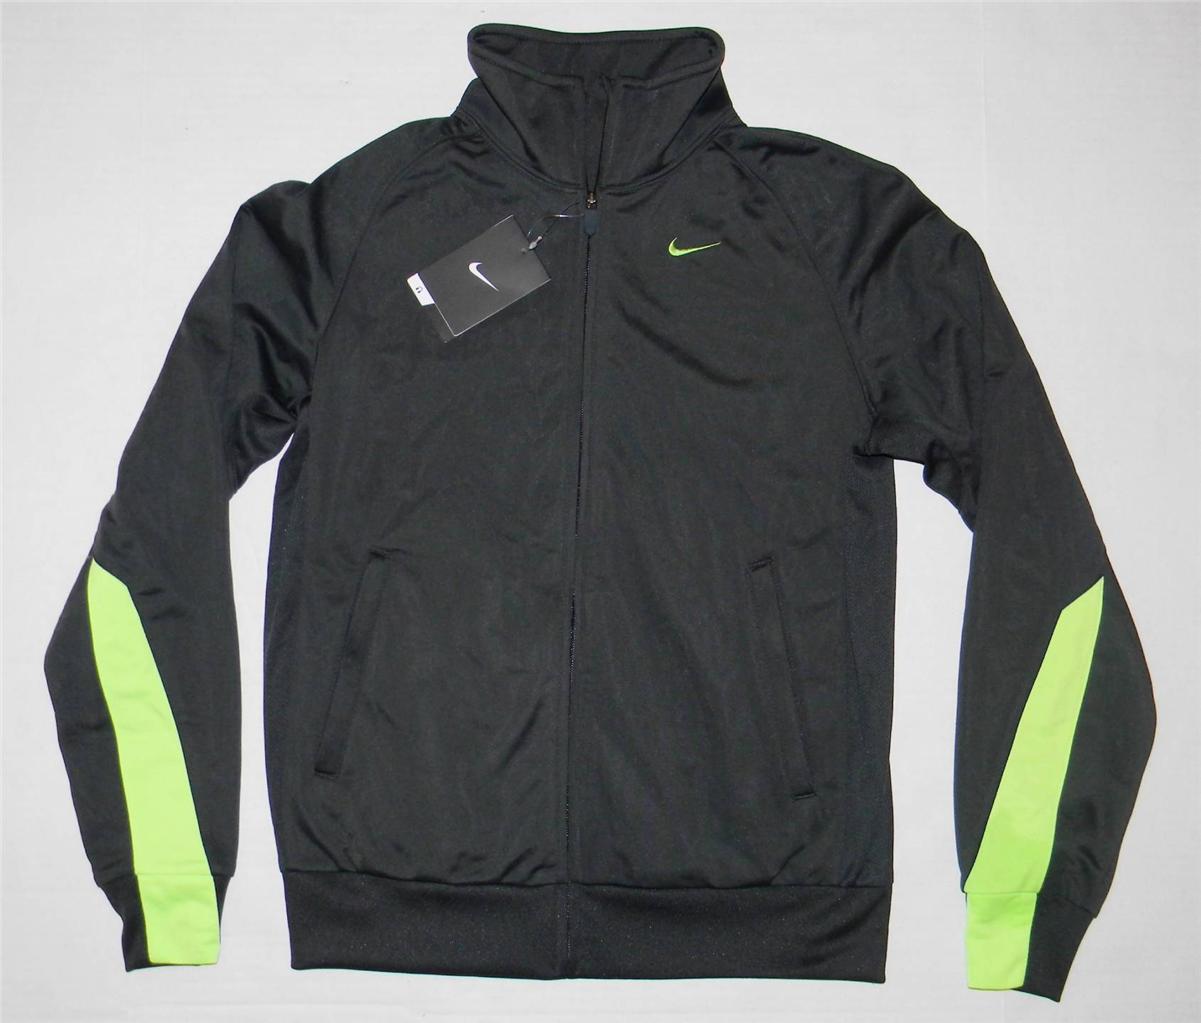 Nike womens track jacket